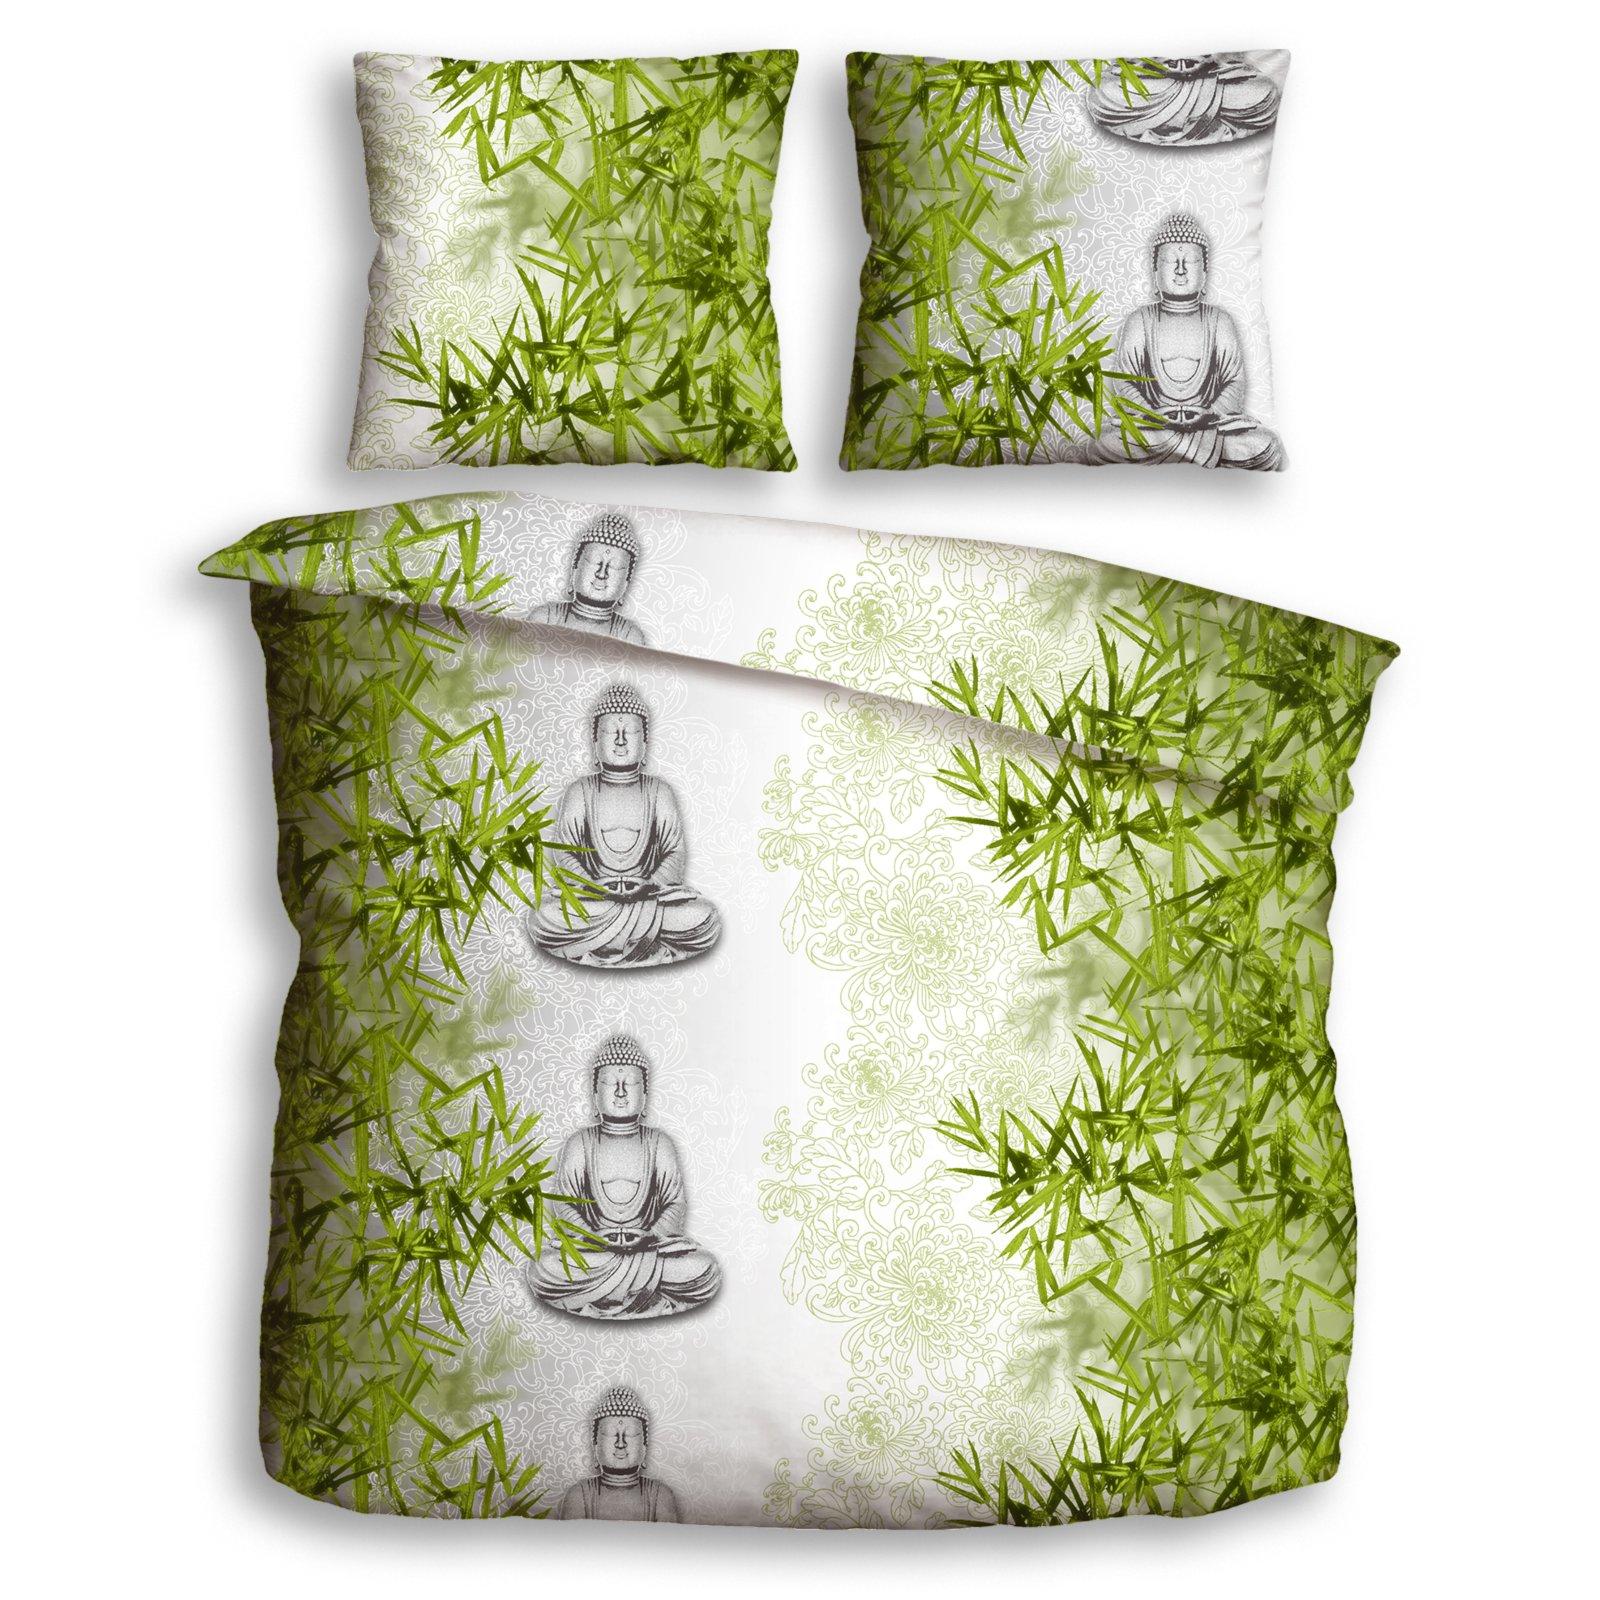 Renforce Bettwasche Buddha Grun Silber 200x200 Cm Bettwasche